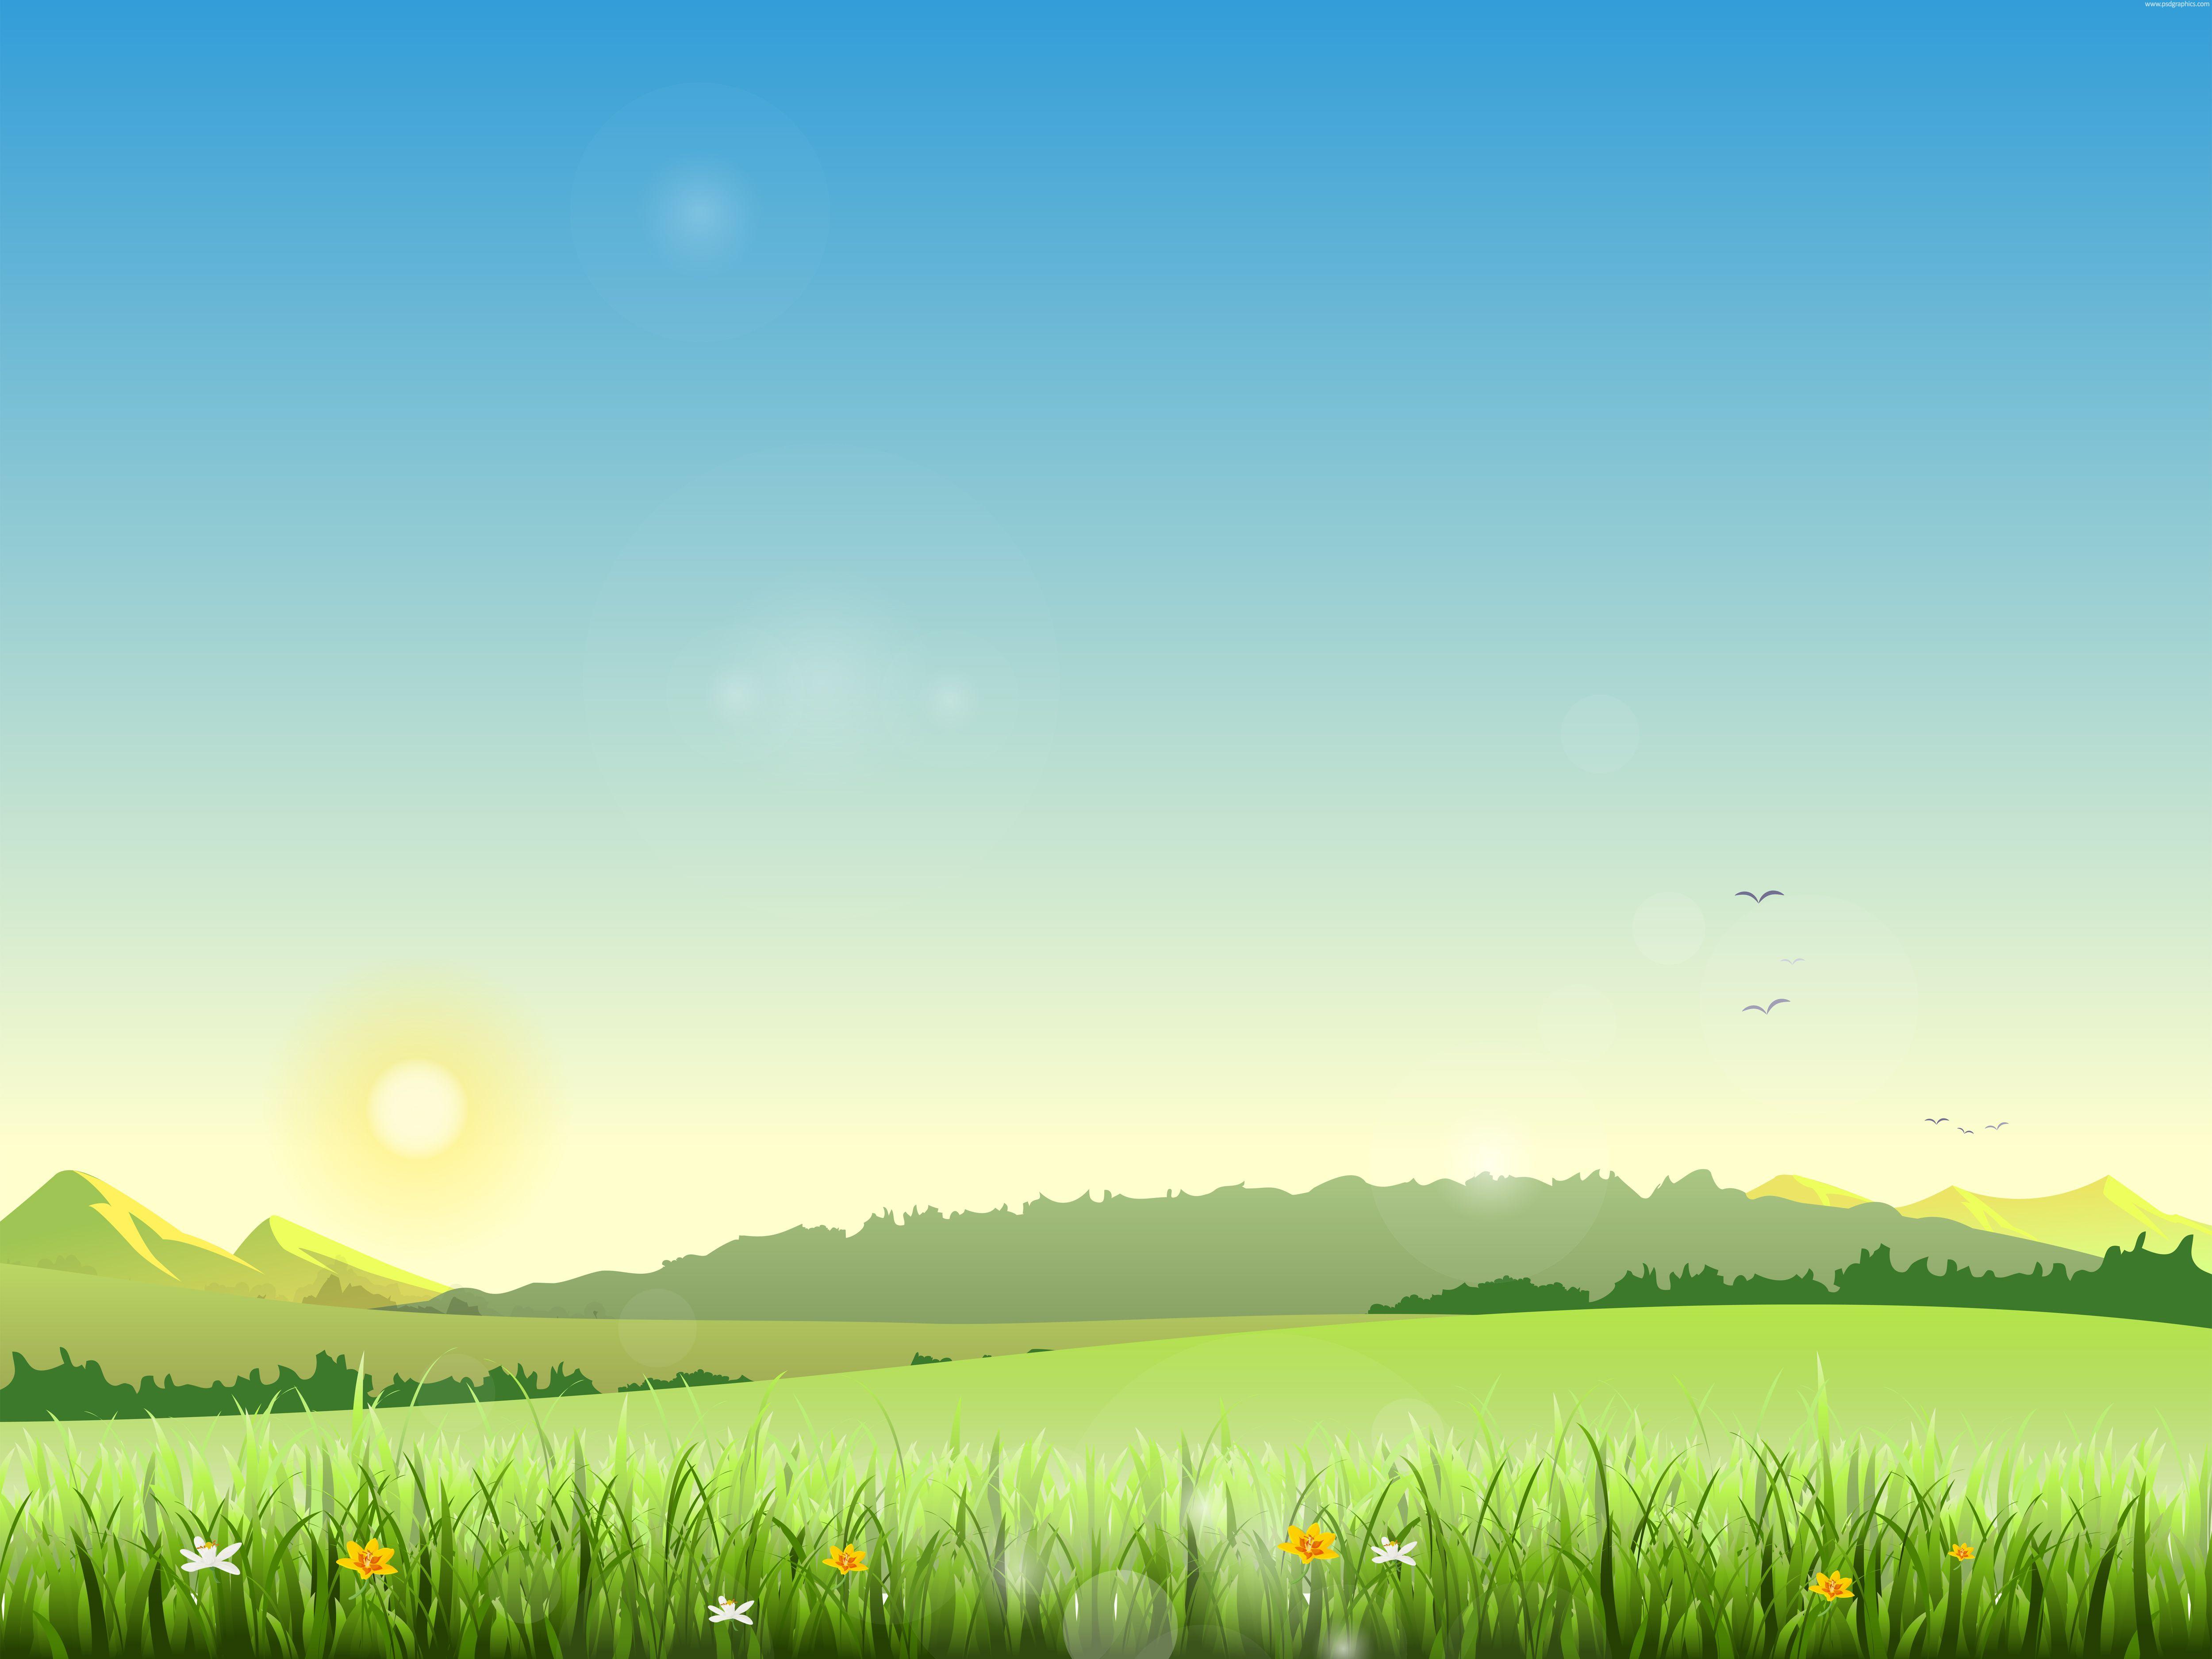 sky illustration - Google Search | Illustration ...